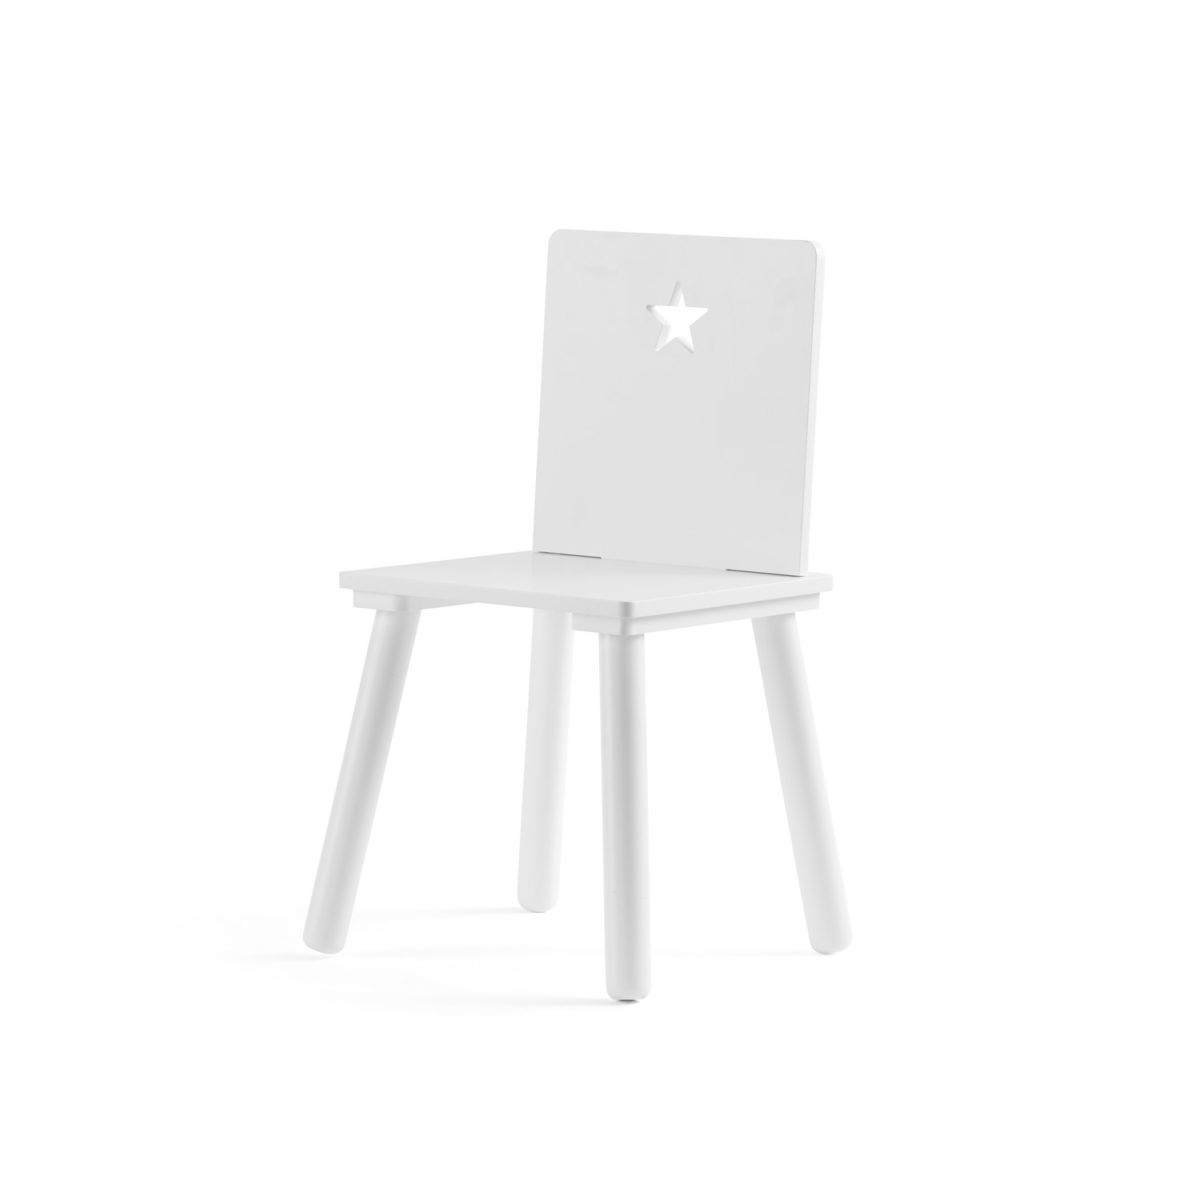 Stuhl Star weiß Sitzhöhe 30 cm